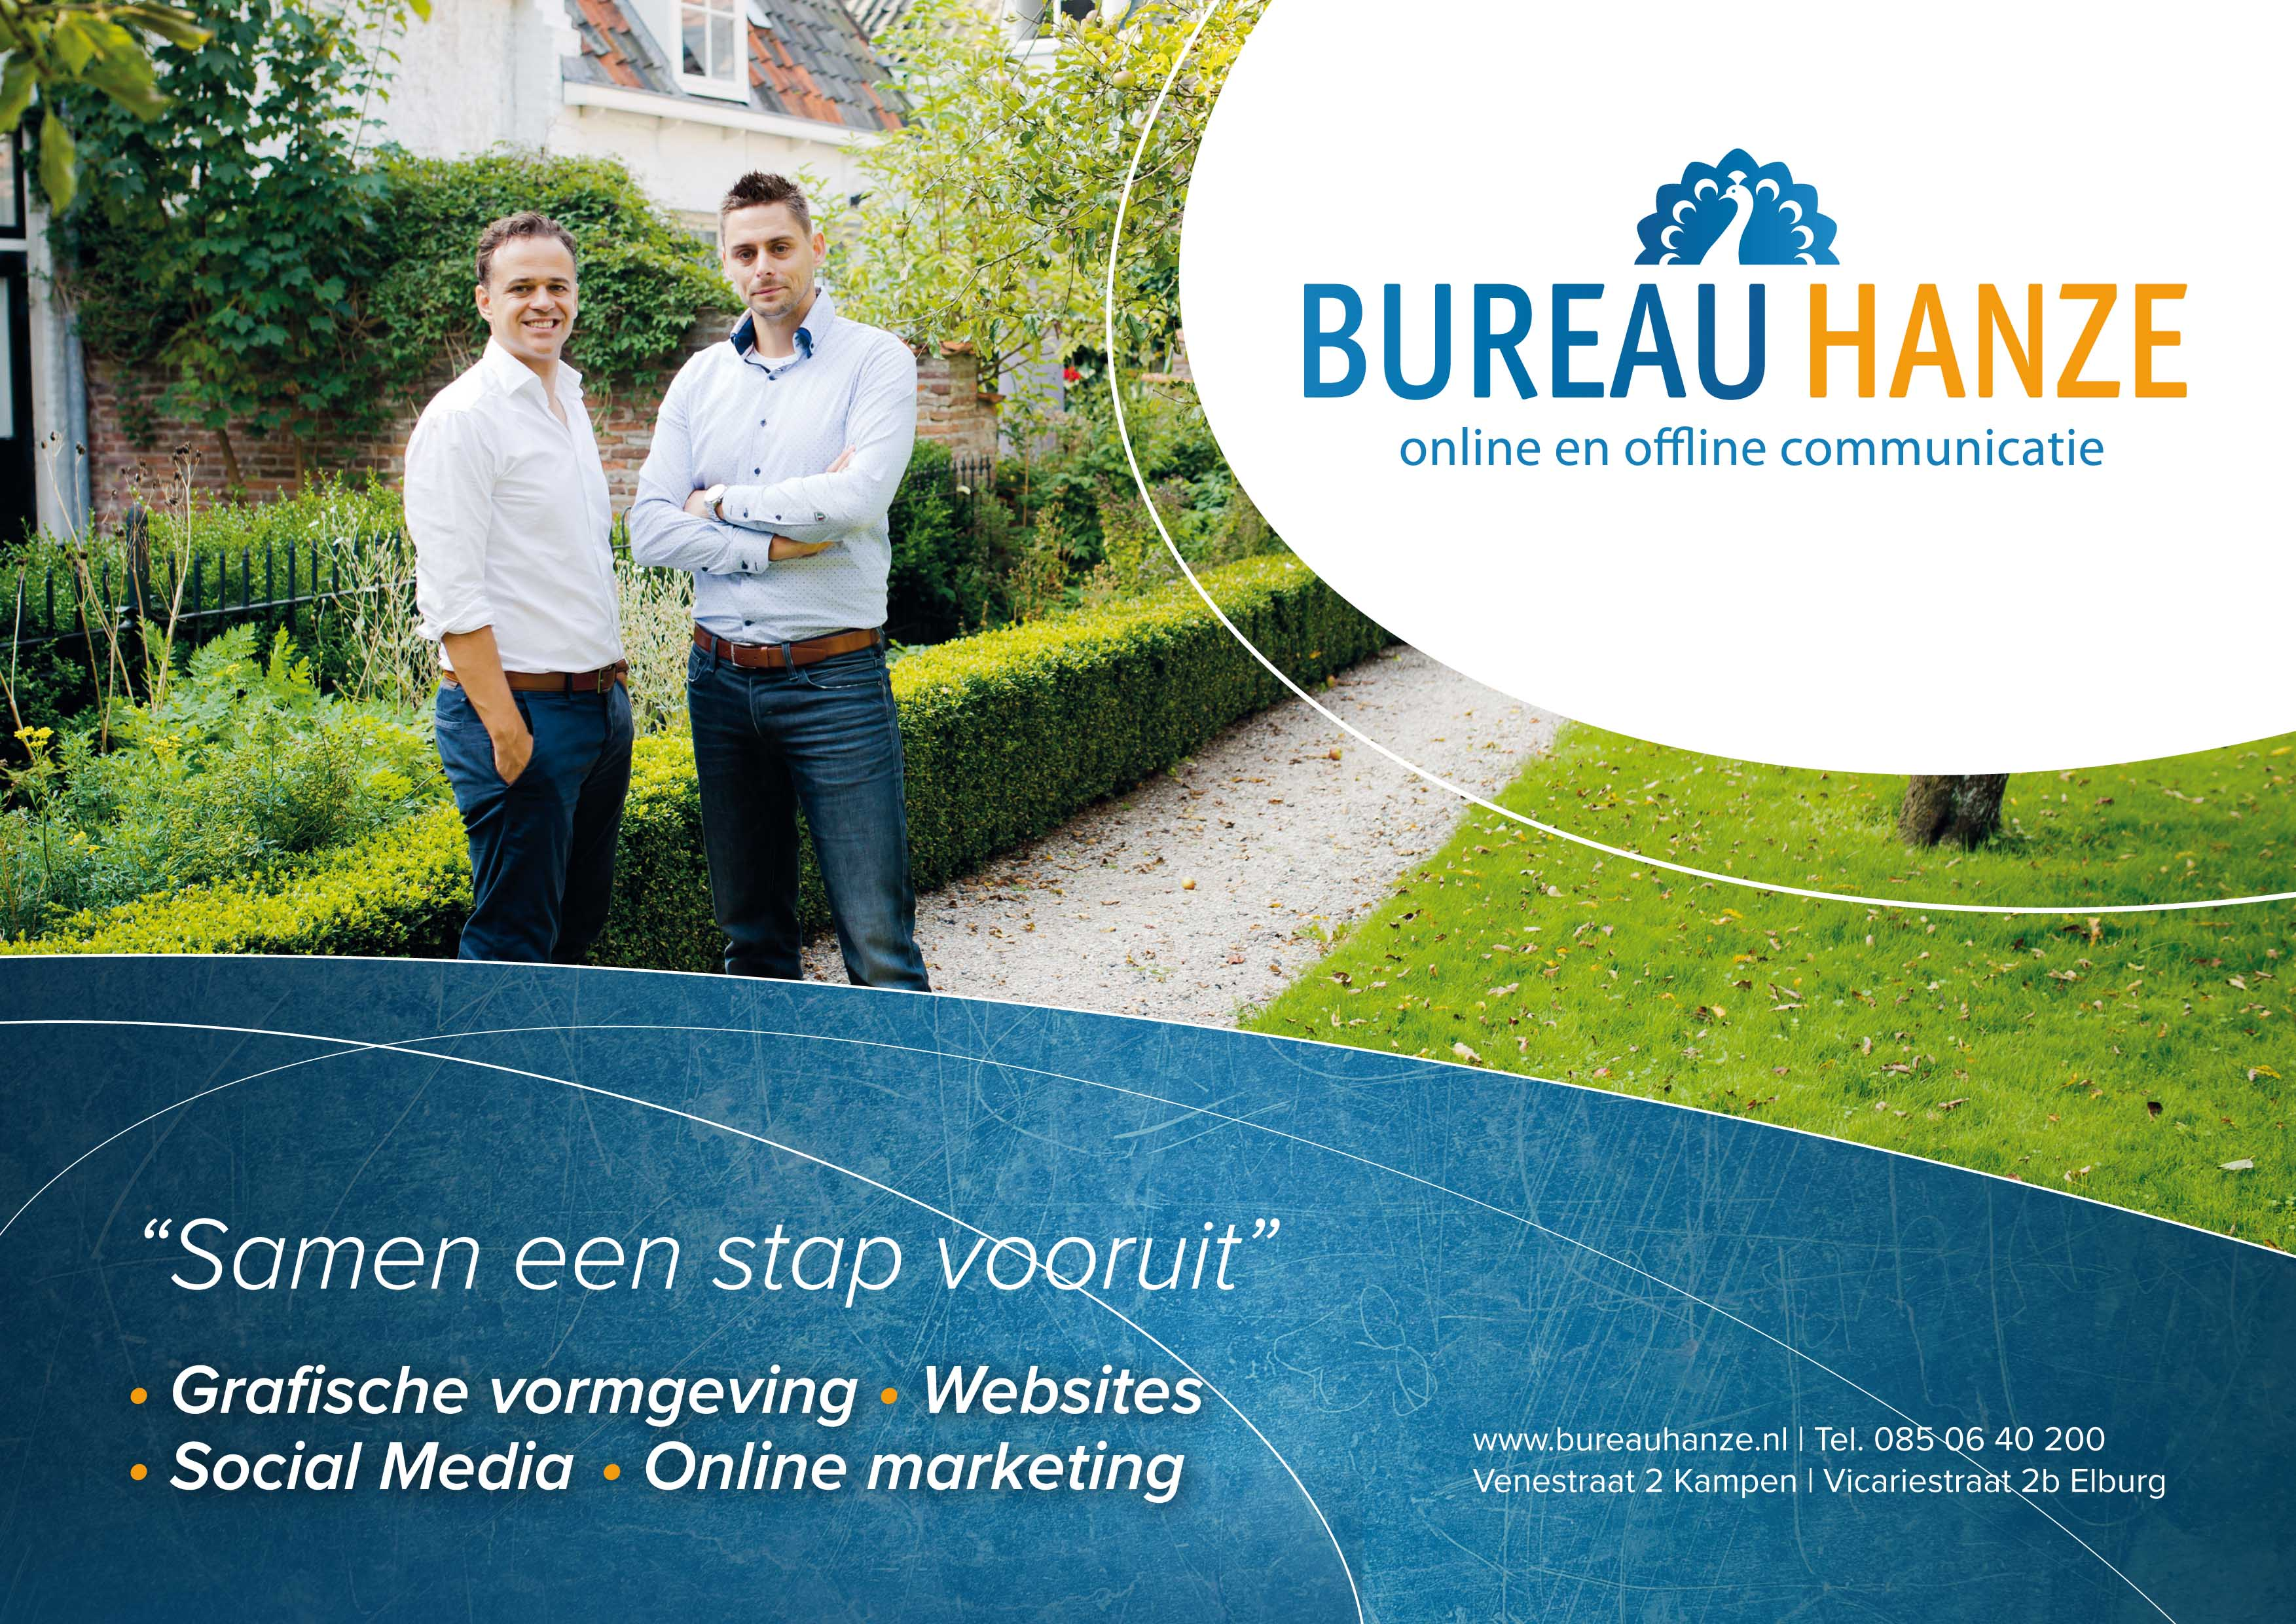 BureauHanze